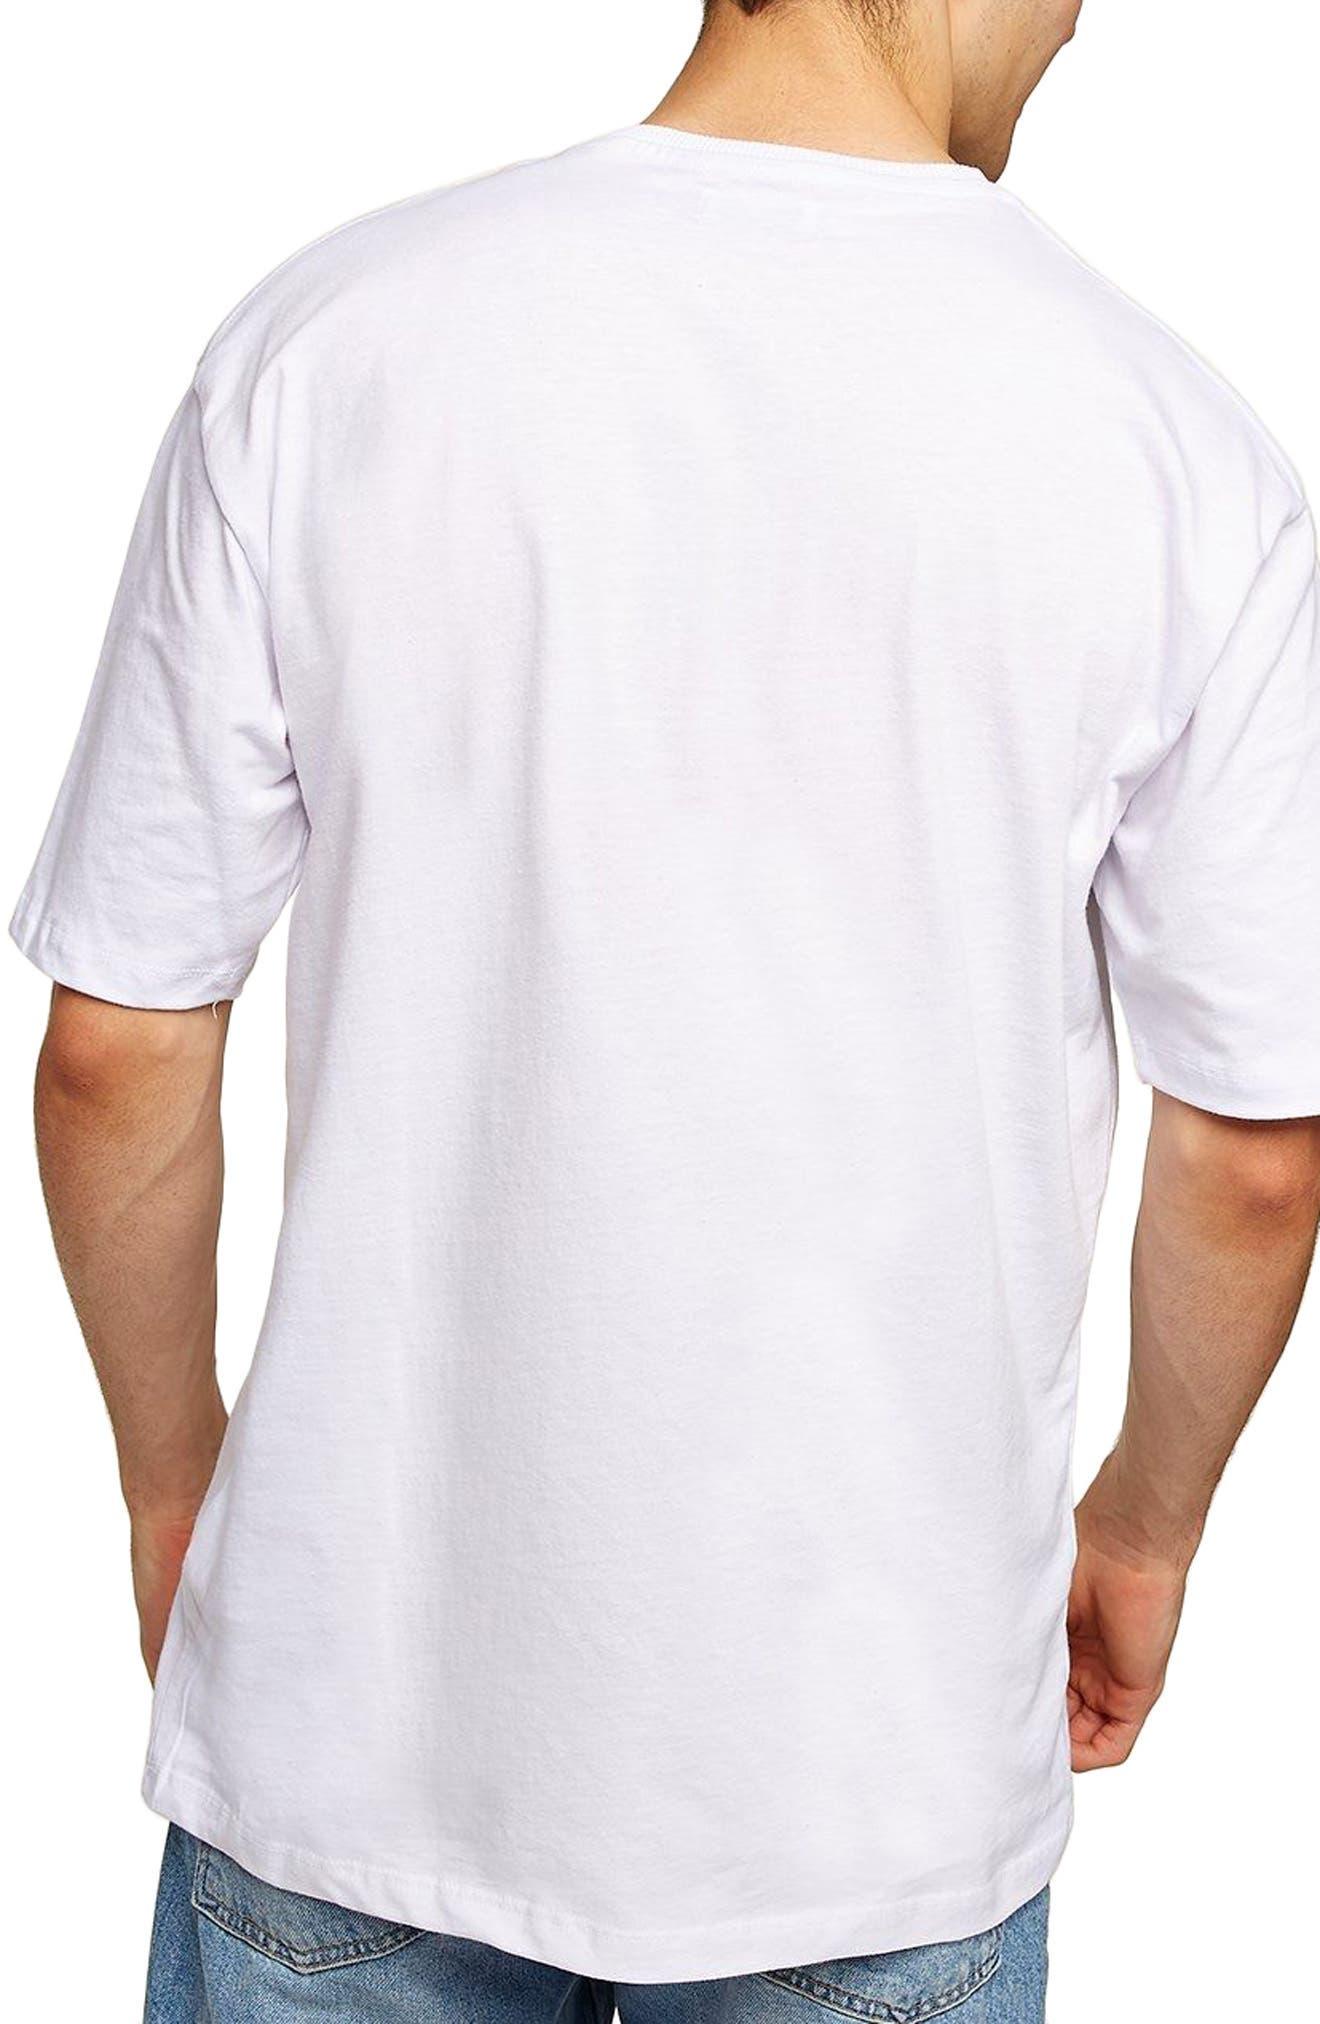 Paradox Graphic T-Shirt,                             Alternate thumbnail 2, color,                             100